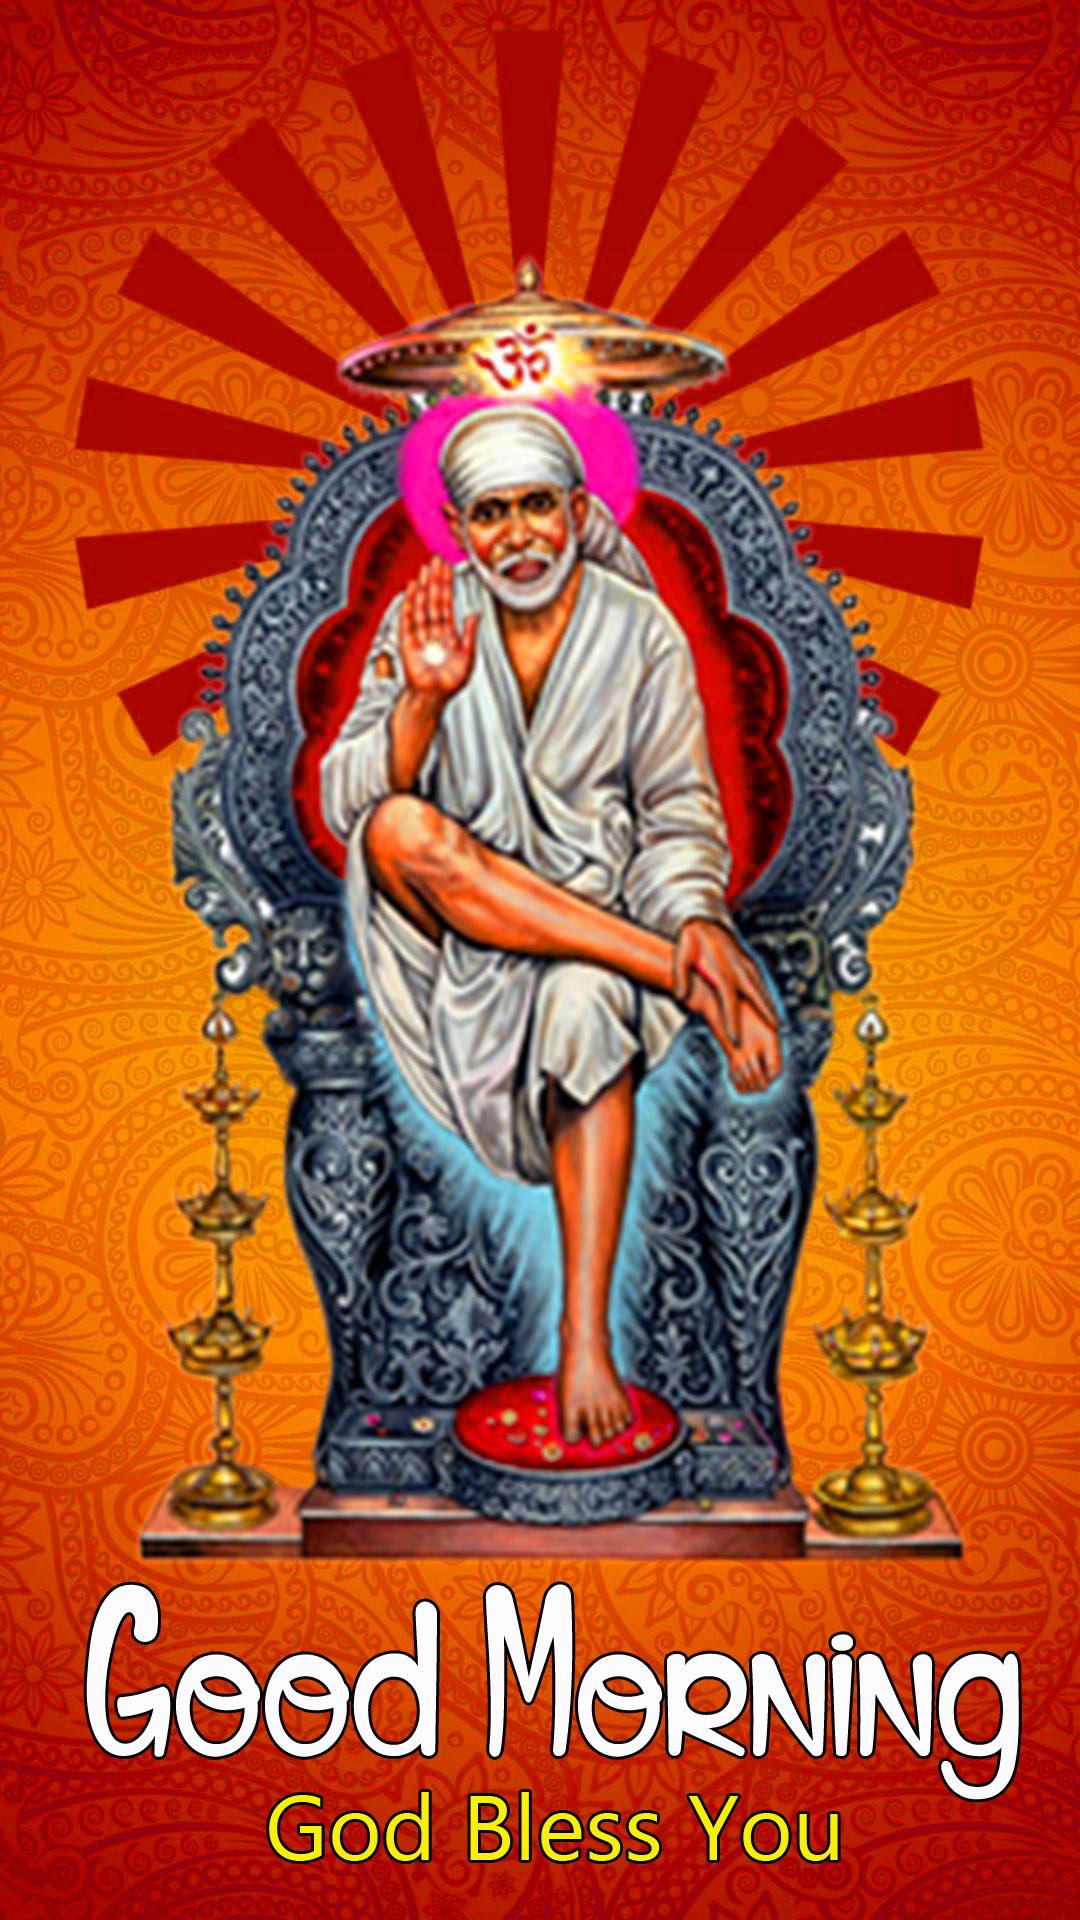 Sai Baba Good Morning Images pics for download